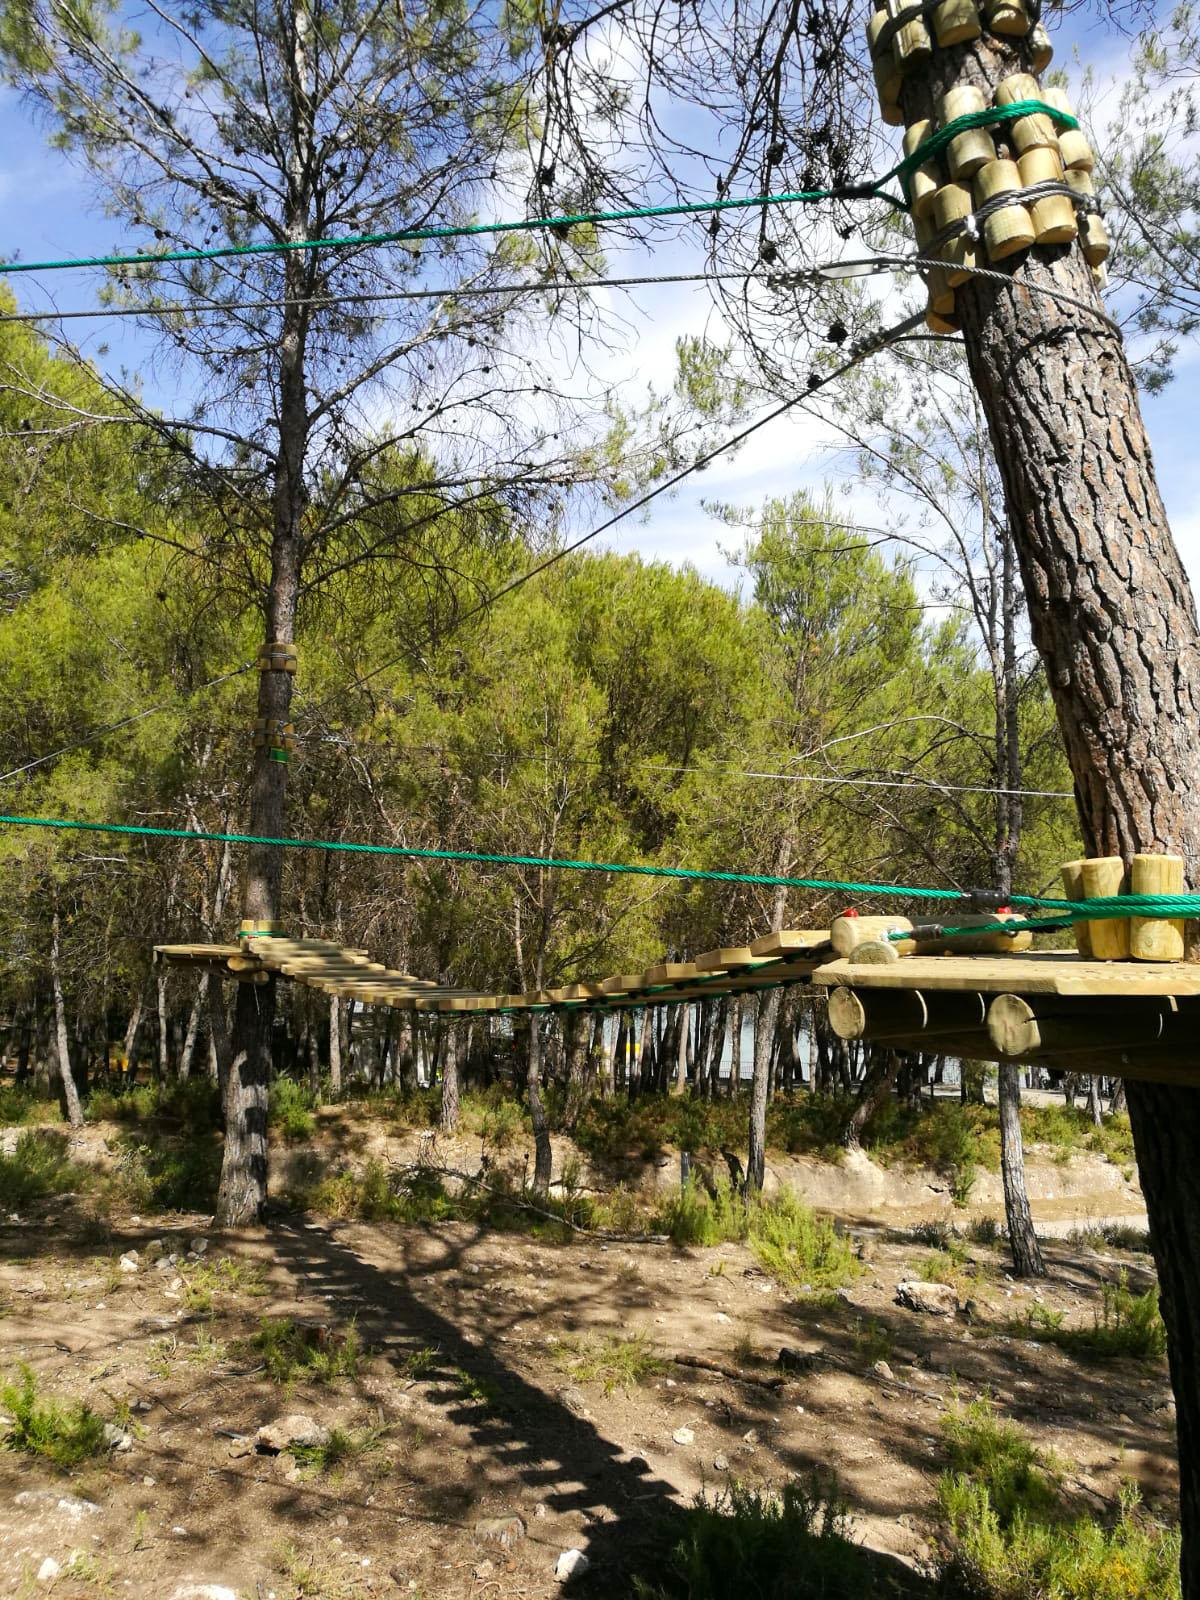 Parque de aventuras entre árboles